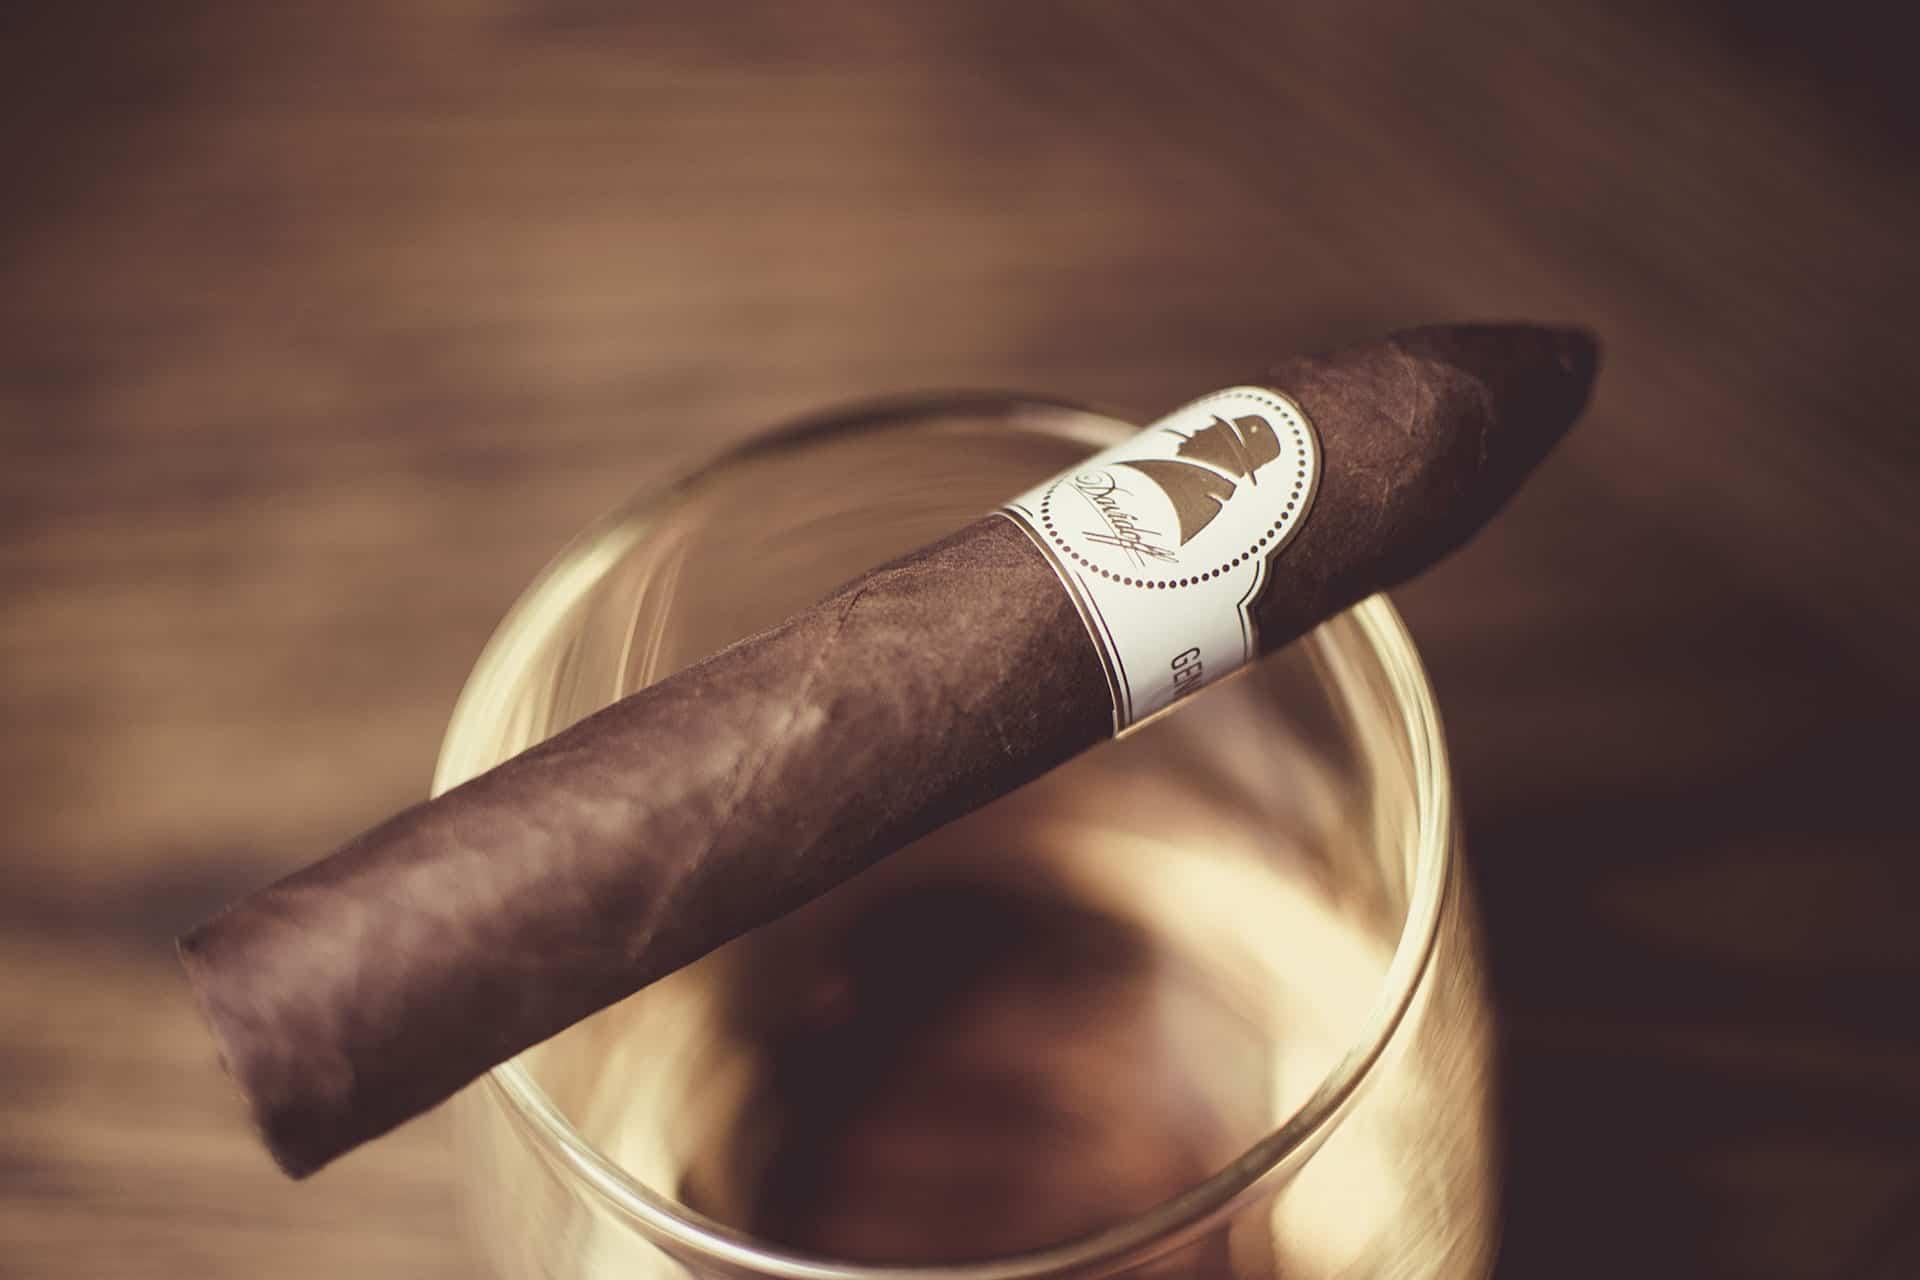 Davidoff Winston Churchill Belicoso Cigar Tin Presentation